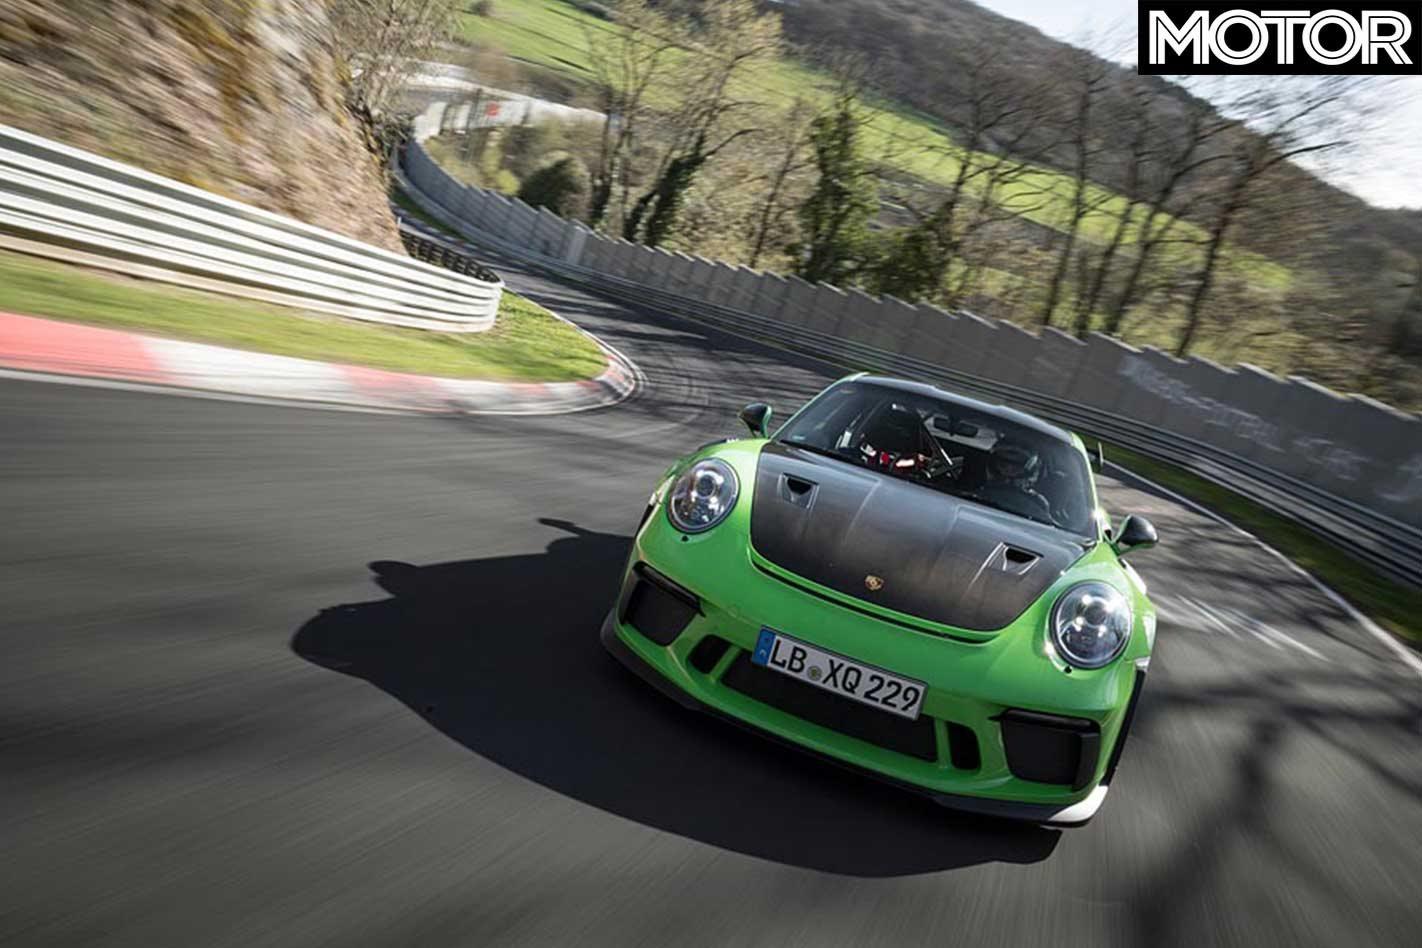 2018 Porsche 911 GT3 RS laps Nurburgring under 7 minutes